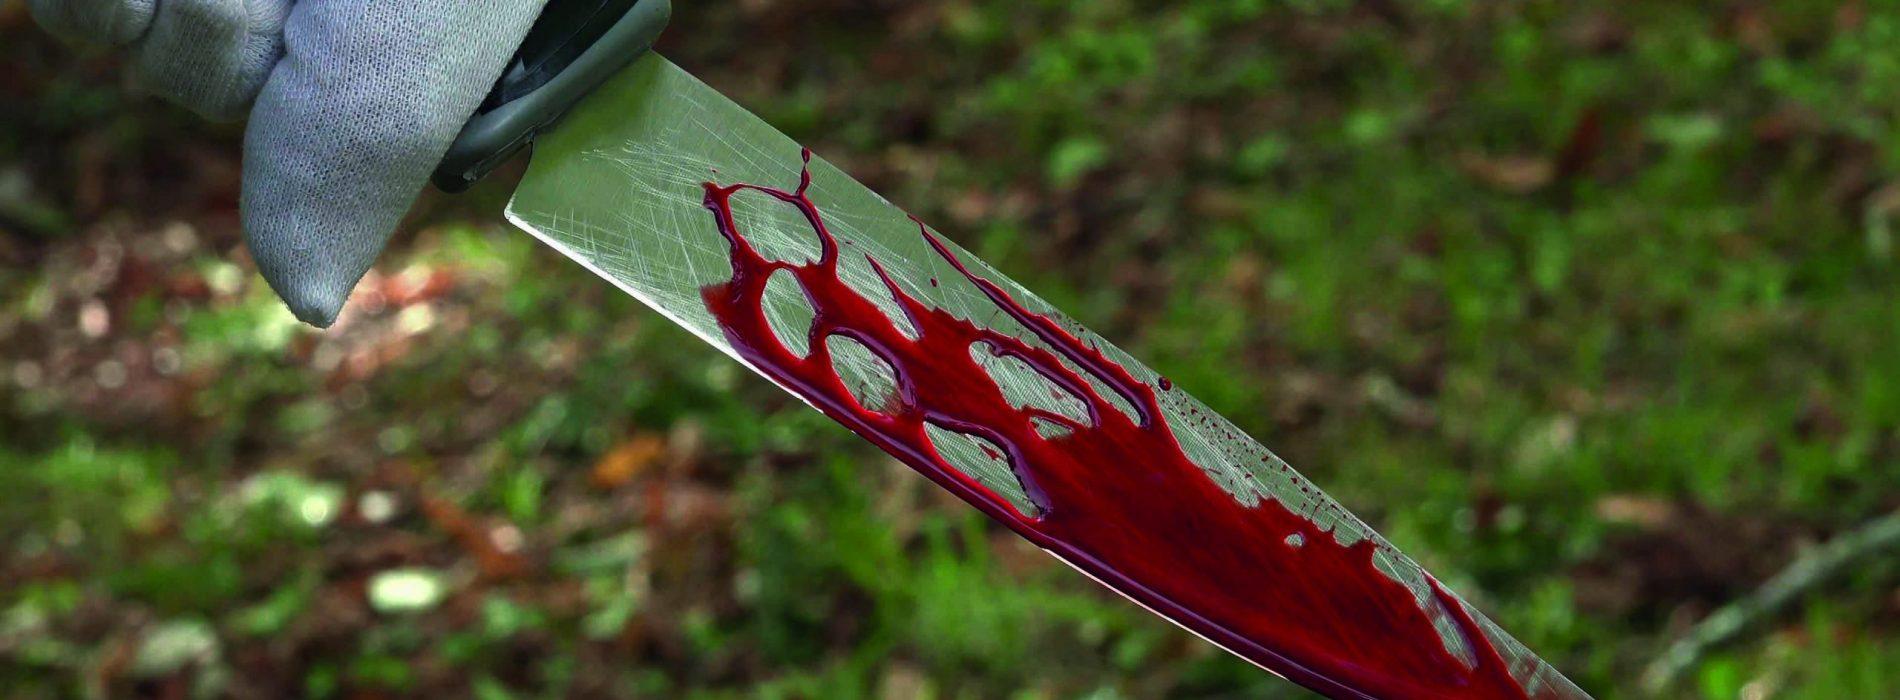 Gruesome murder shocks villagers